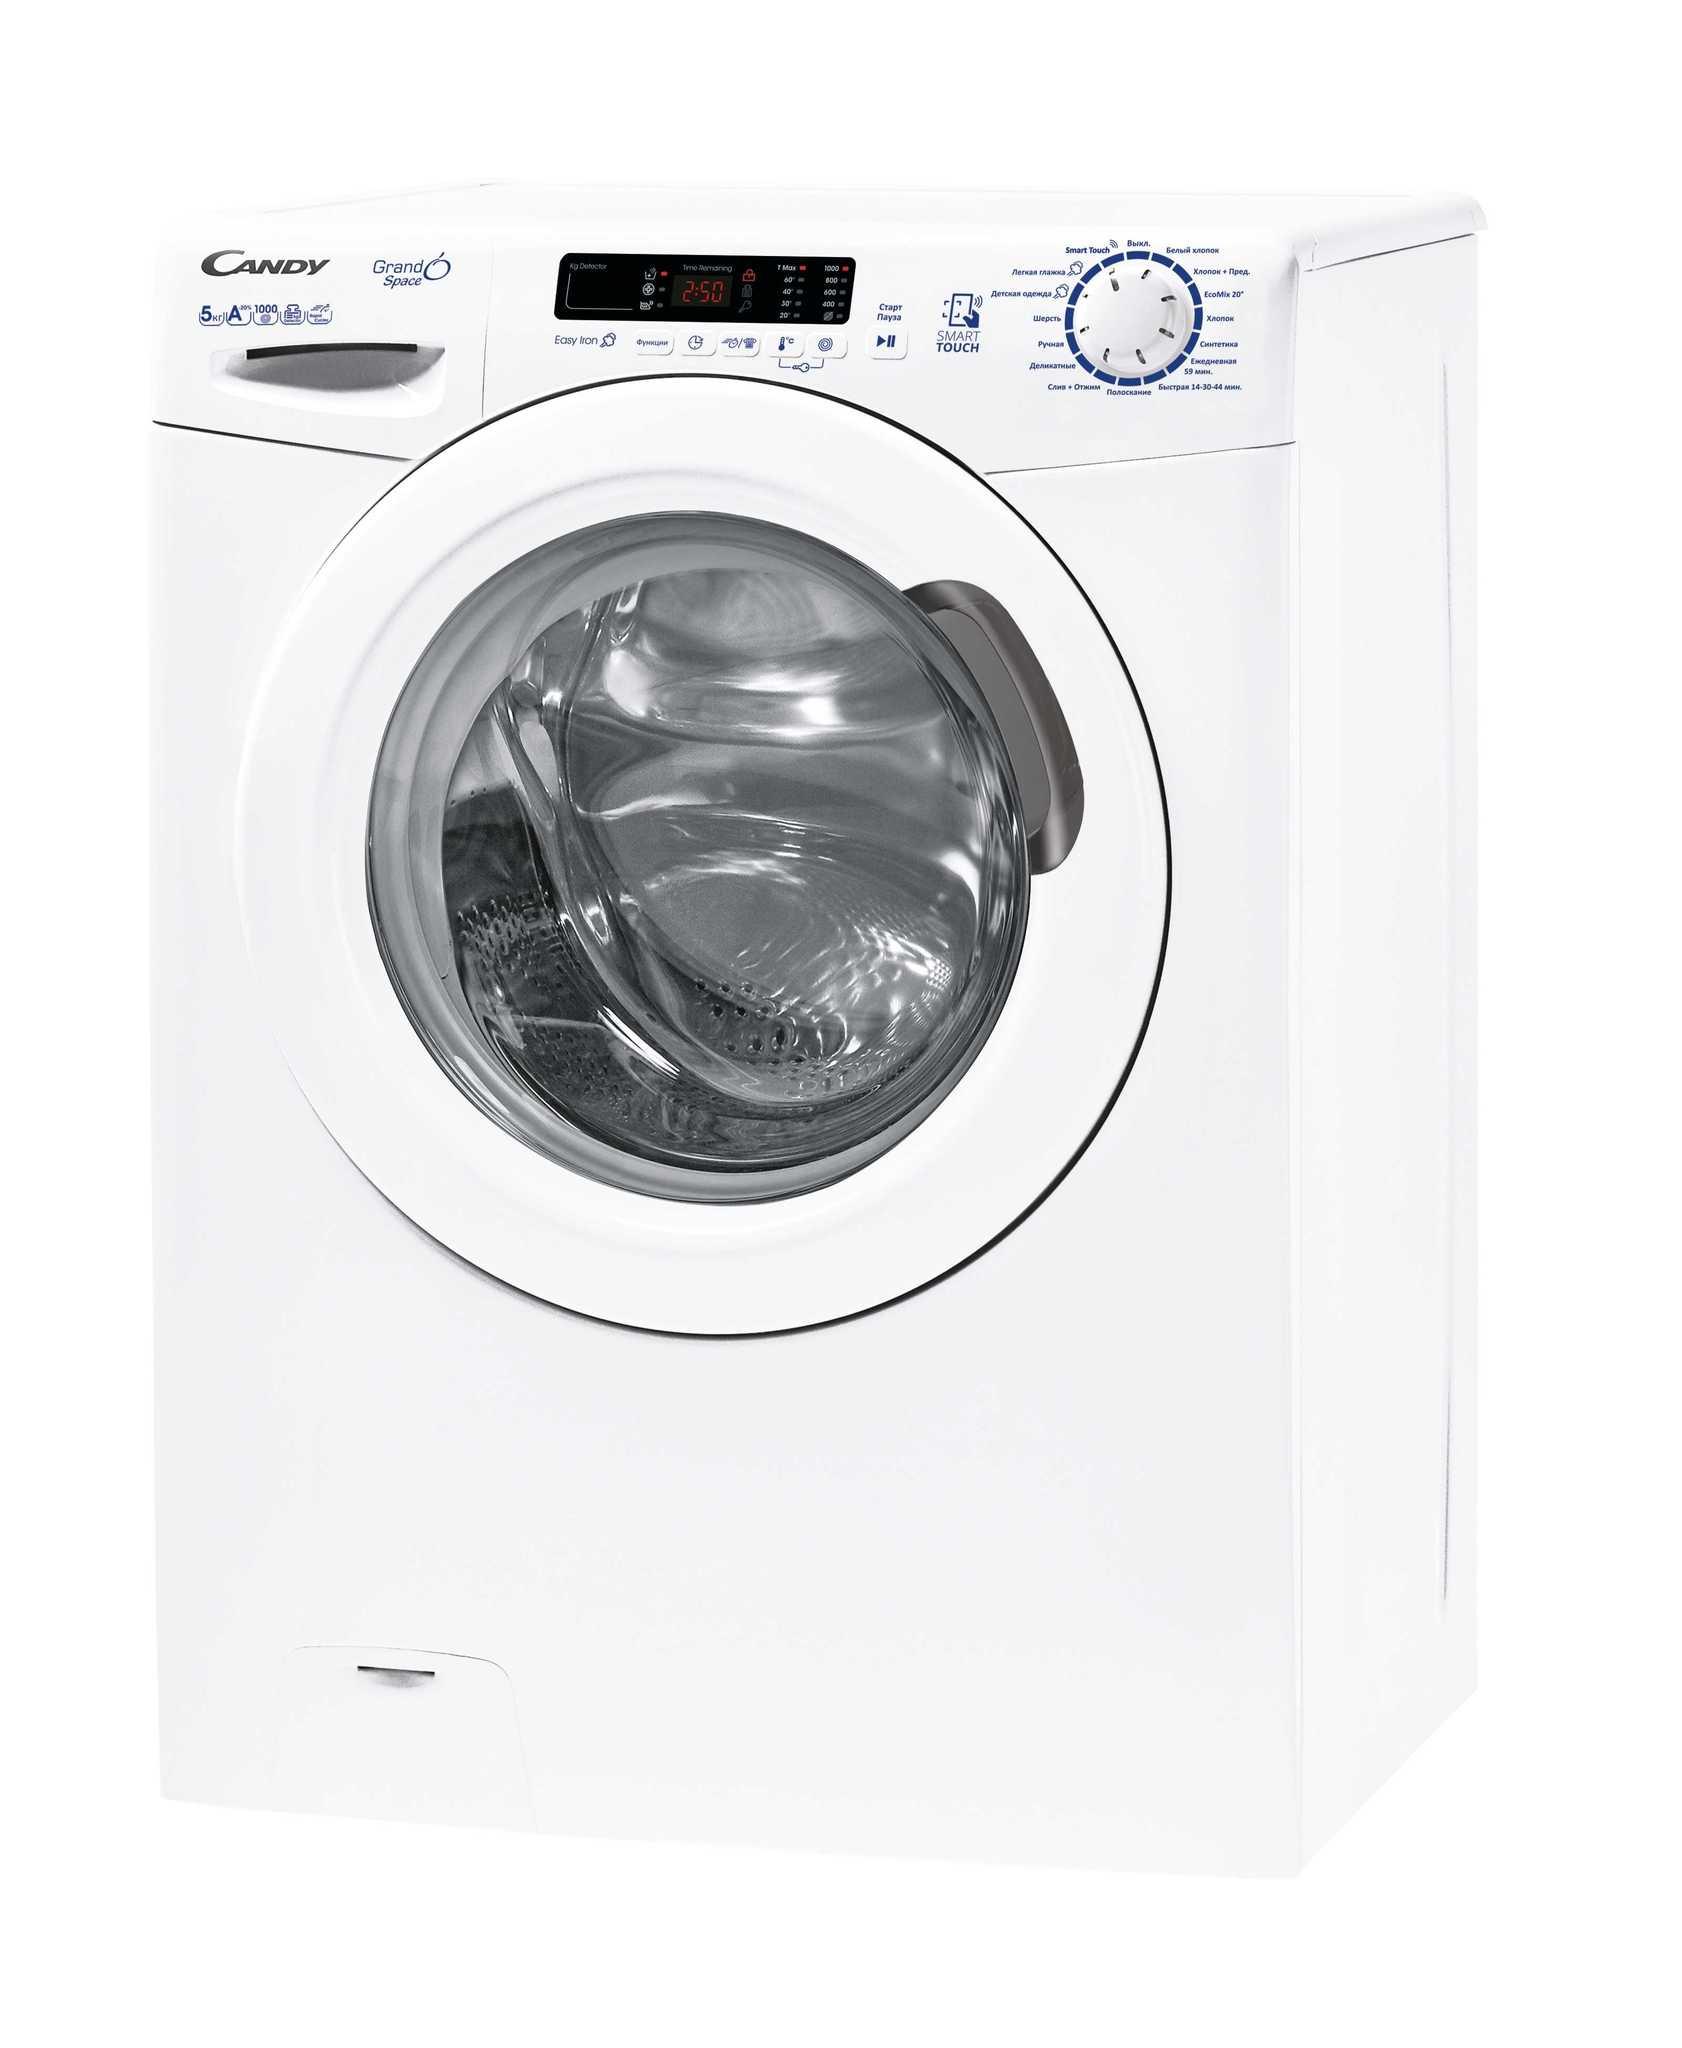 Узкая стиральная машина Candy MCSS41052D2/2-07 фото